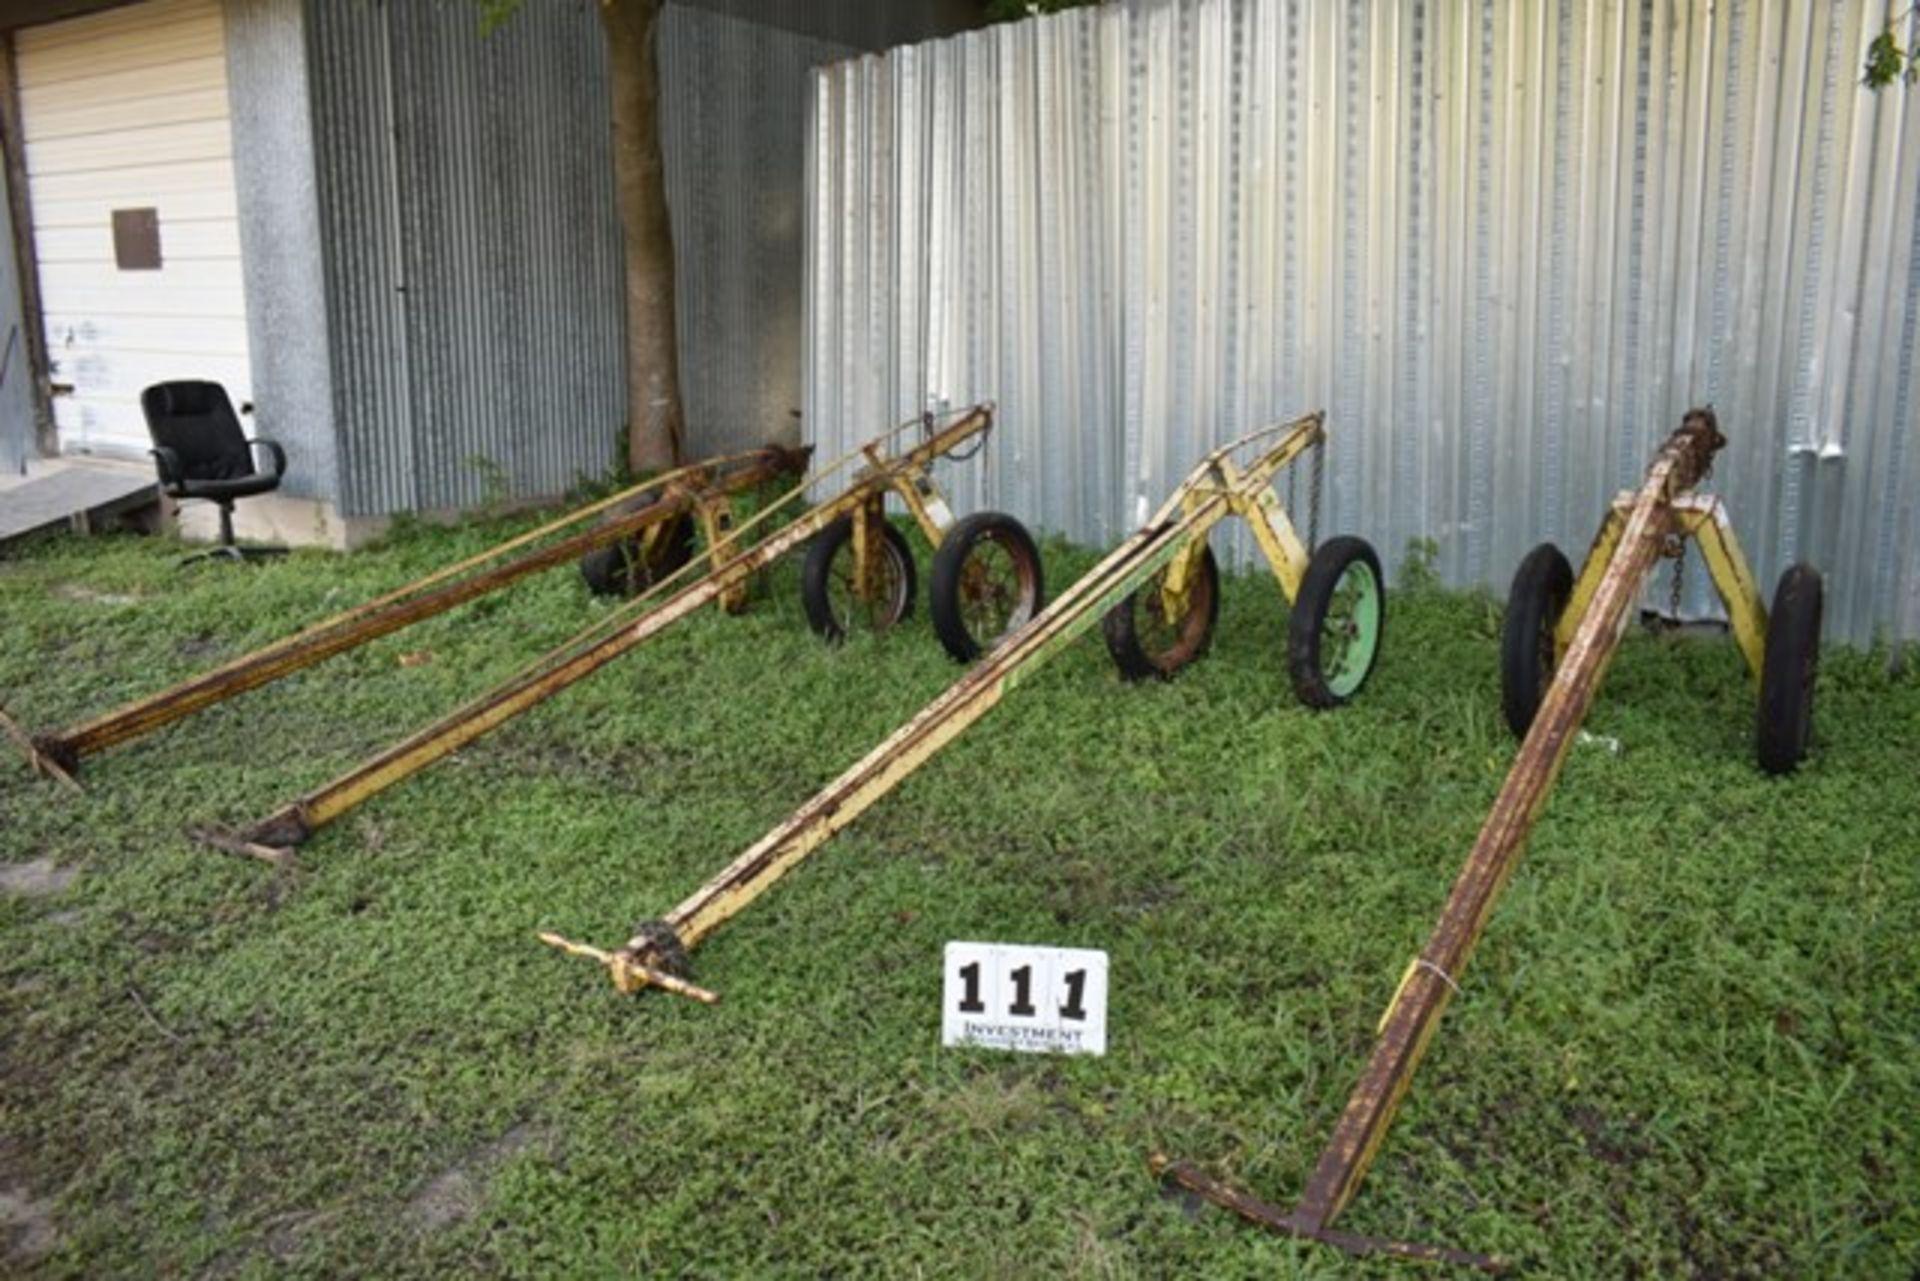 Lot 111 - (4) GRASSHOPPER PIPE DOLLIES, (1) MISSING WHEEL